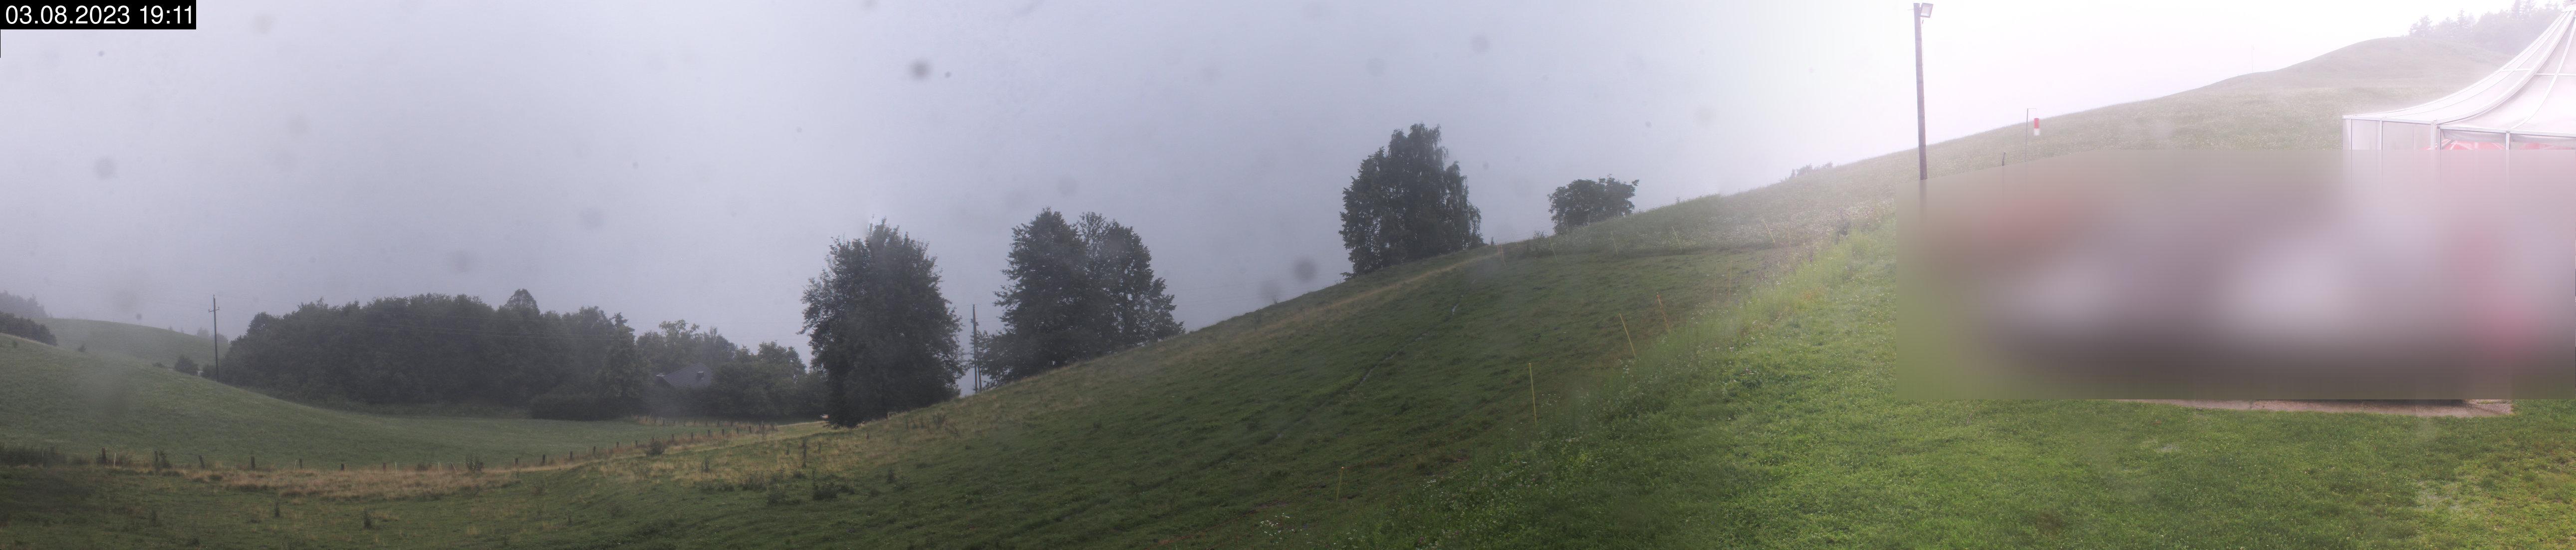 Villach-Drobollach / Österreich